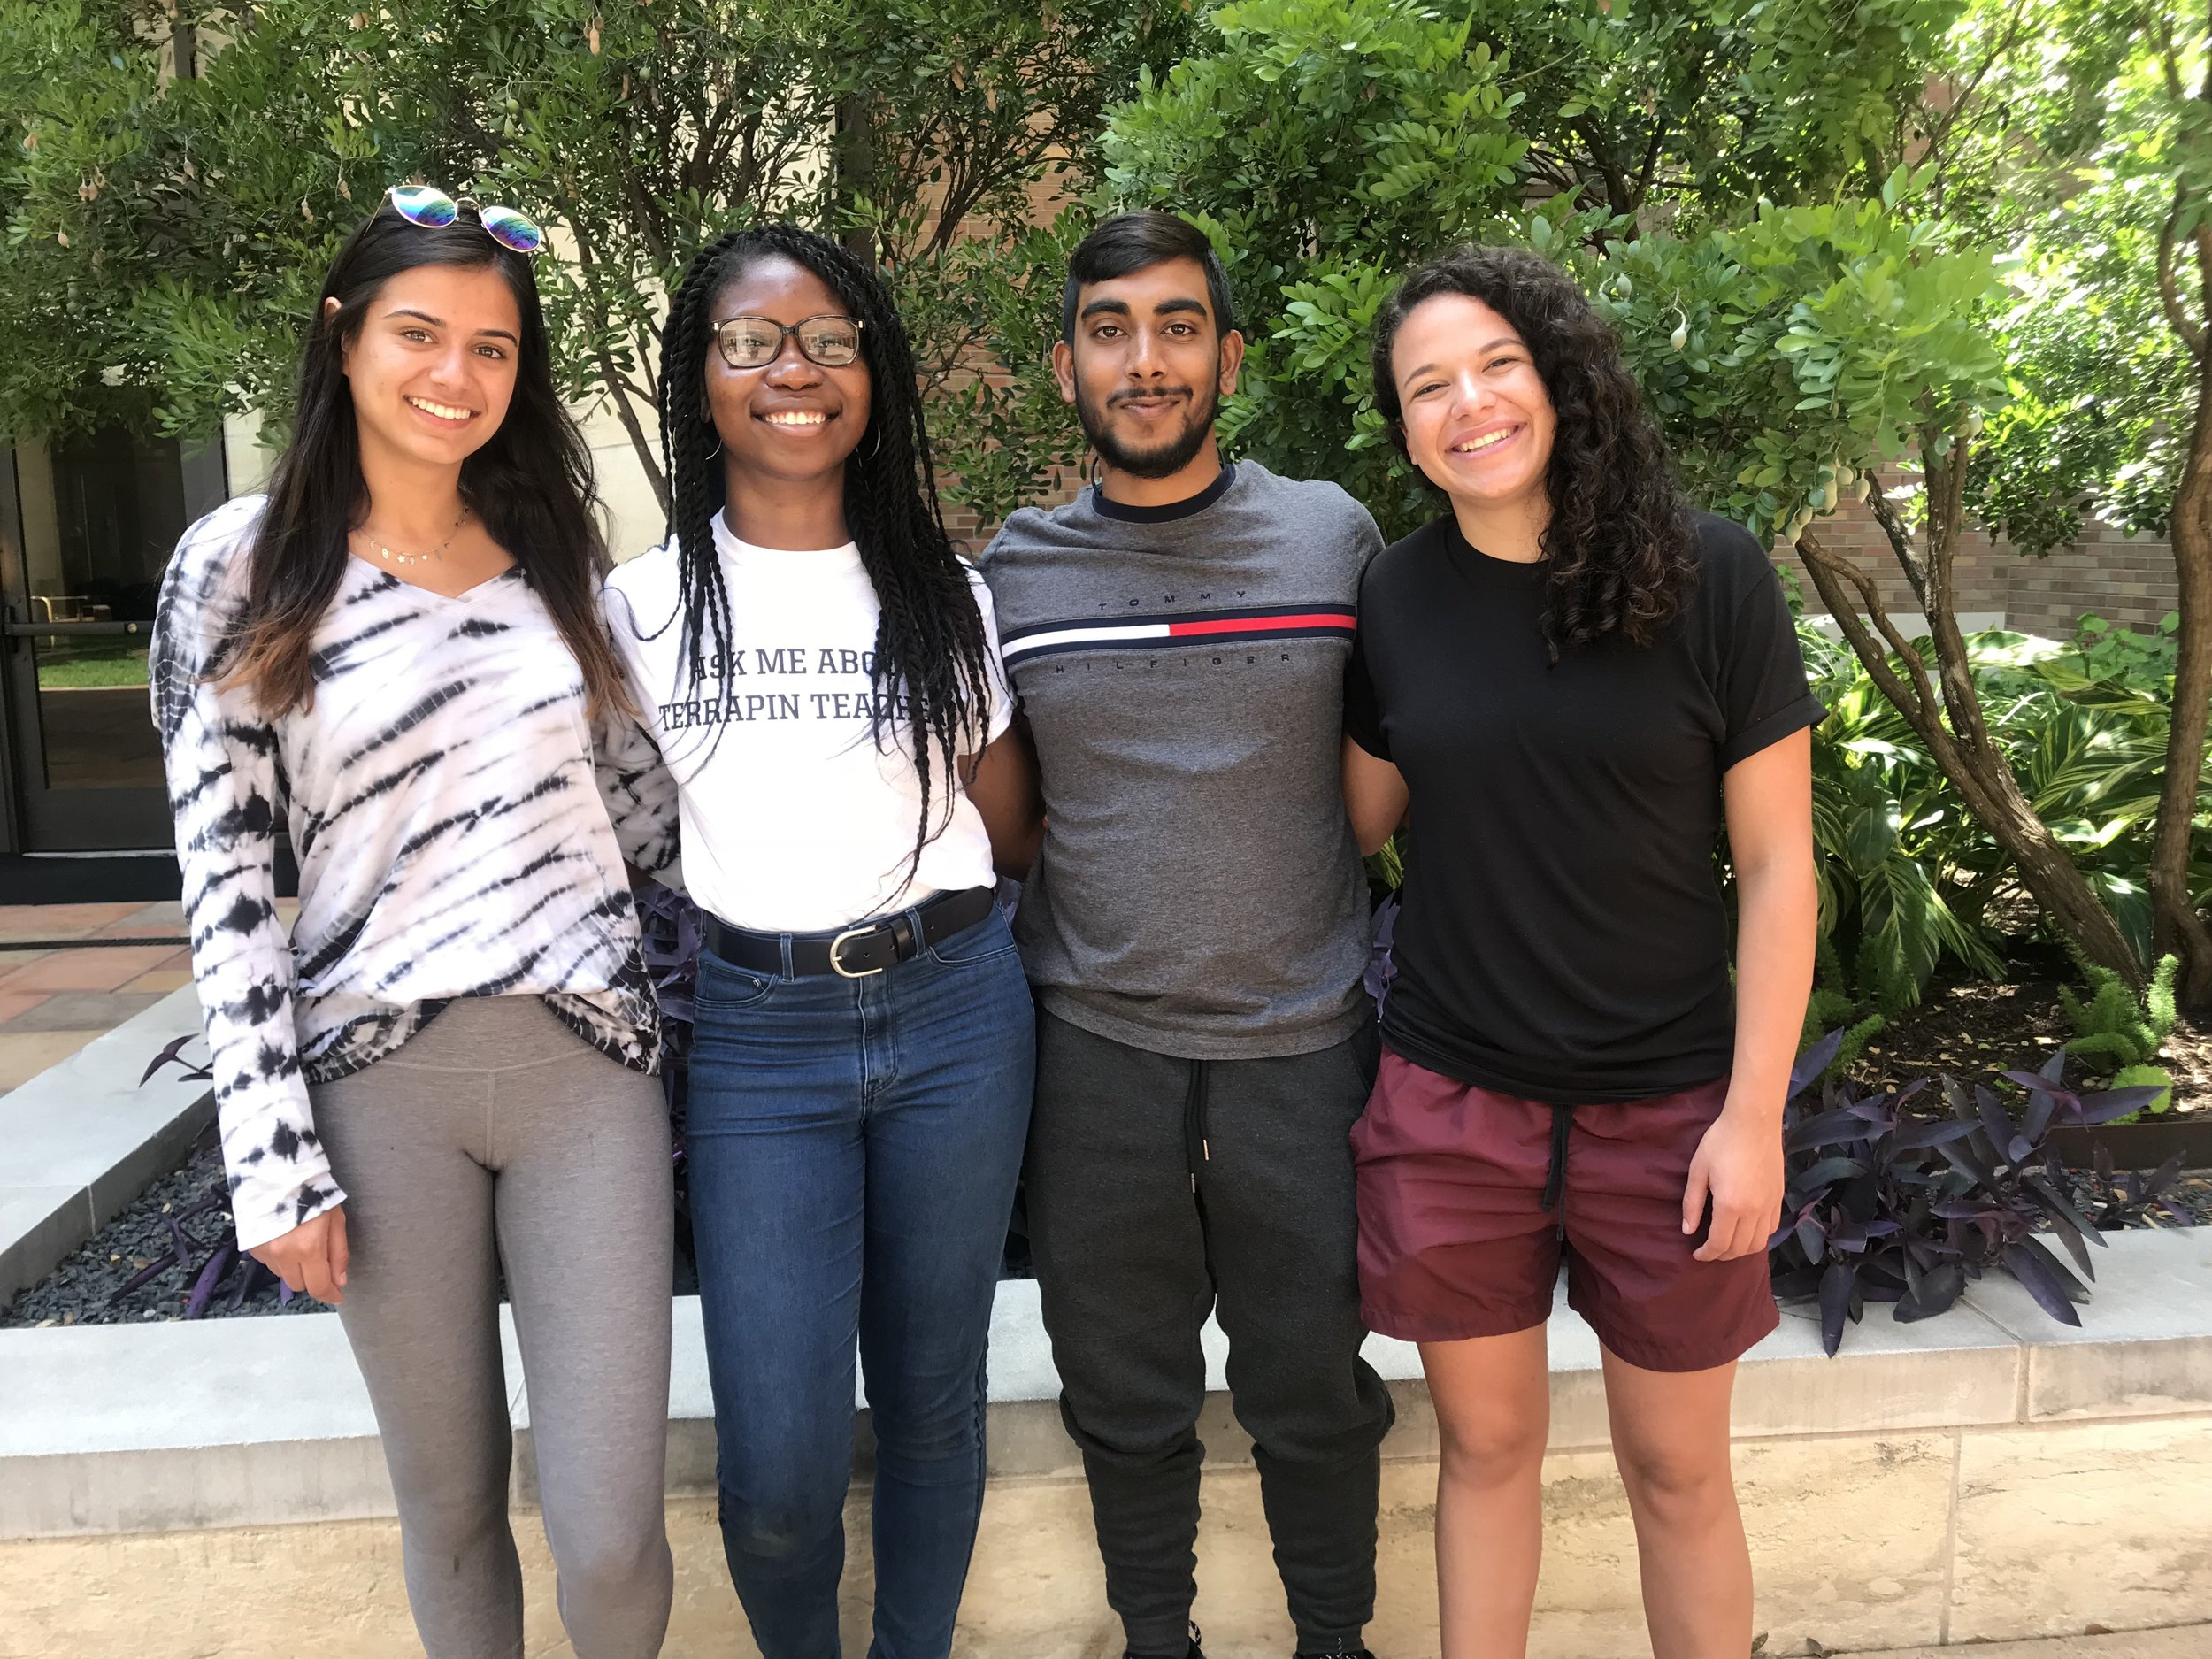 (photo credit: Jahaira Dixon)   (left to right: Tara Tanasavich,  Precious Azike, Joshua Pooranmal, Vanessa Wagener)